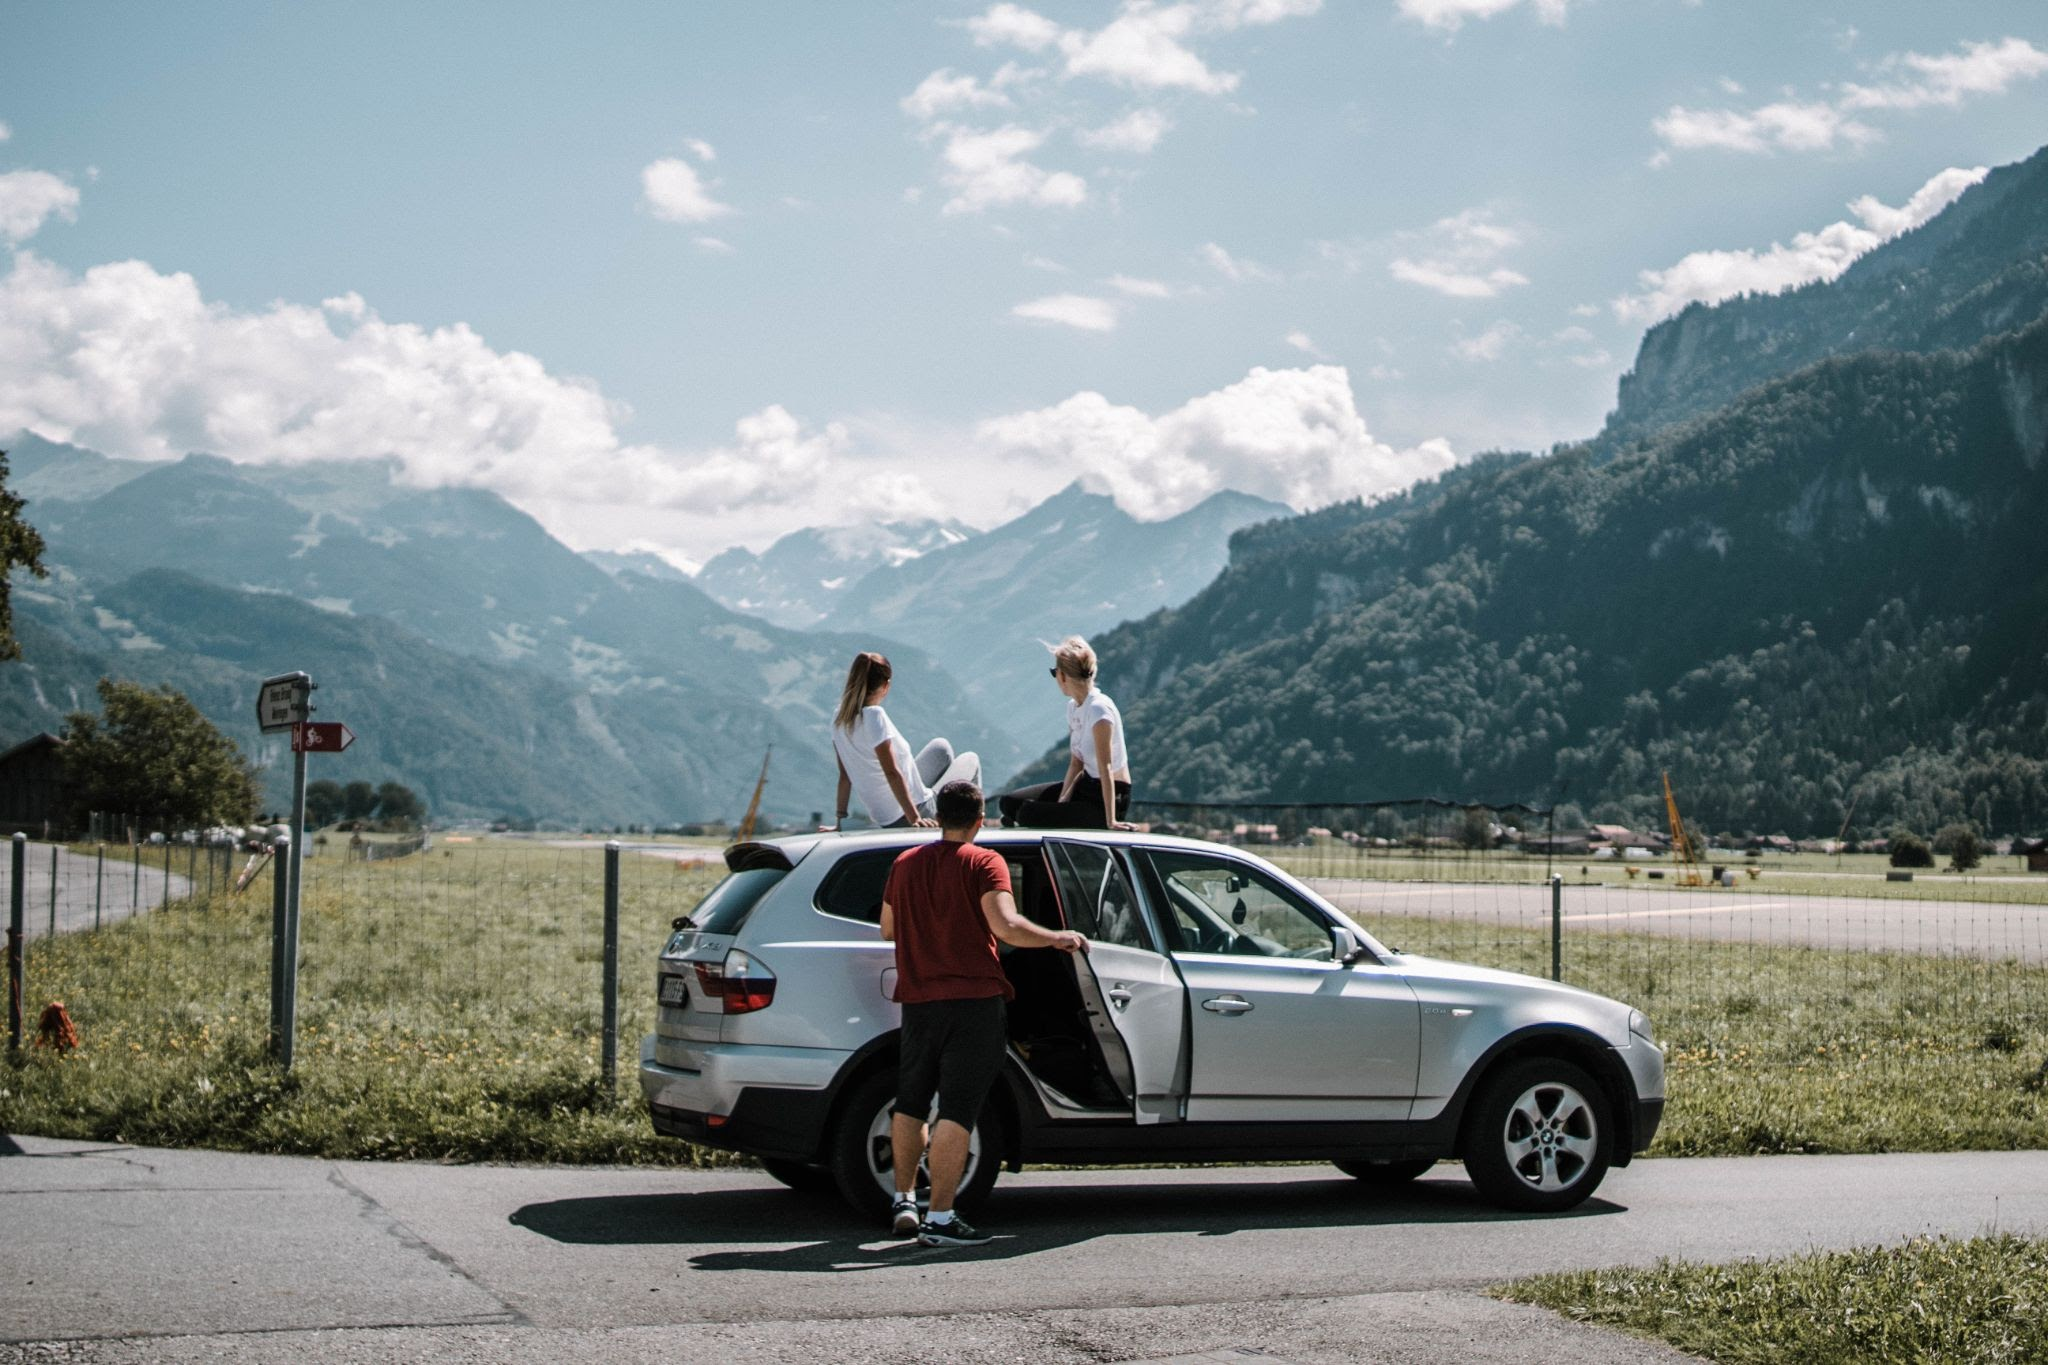 How To Make Your Next Road Trip More Enjoyable | Travel Tips | Elle Blonde Luxury Lifestyle Destination Blog